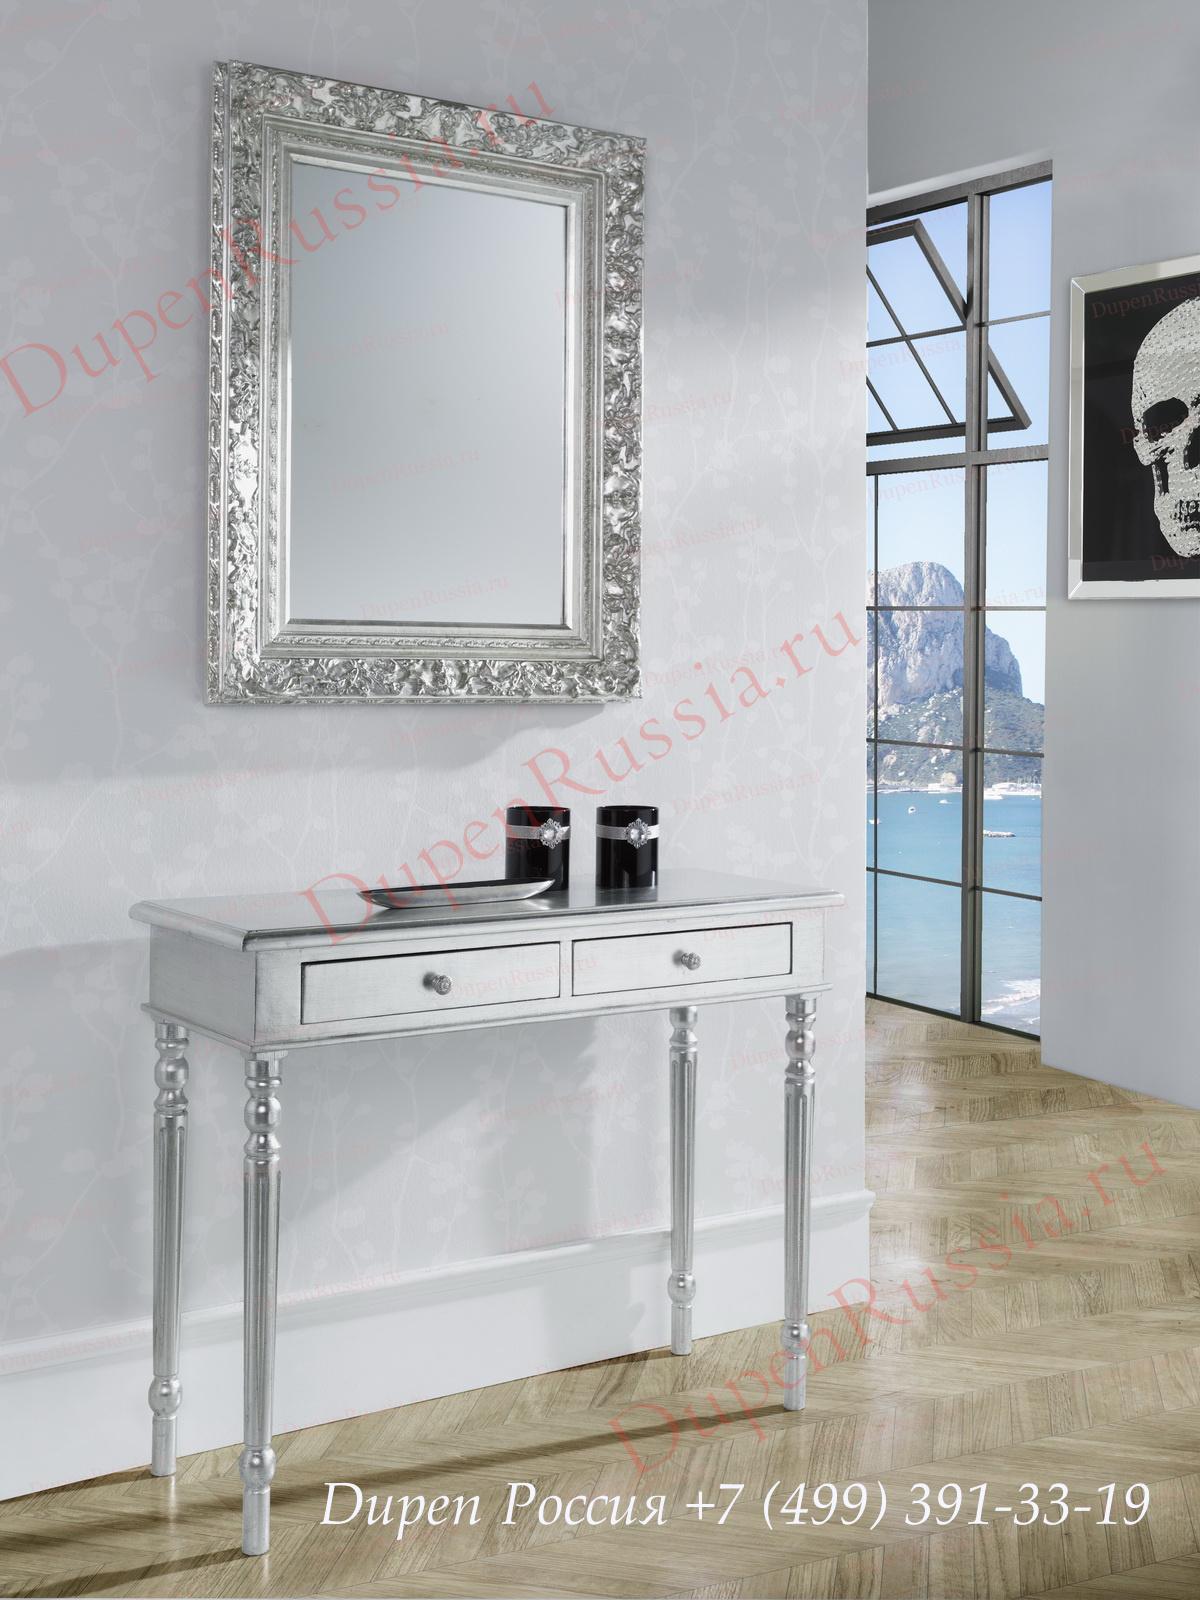 Зеркало DUPEN (Дюпен) E-201, консоль DUPEN K60